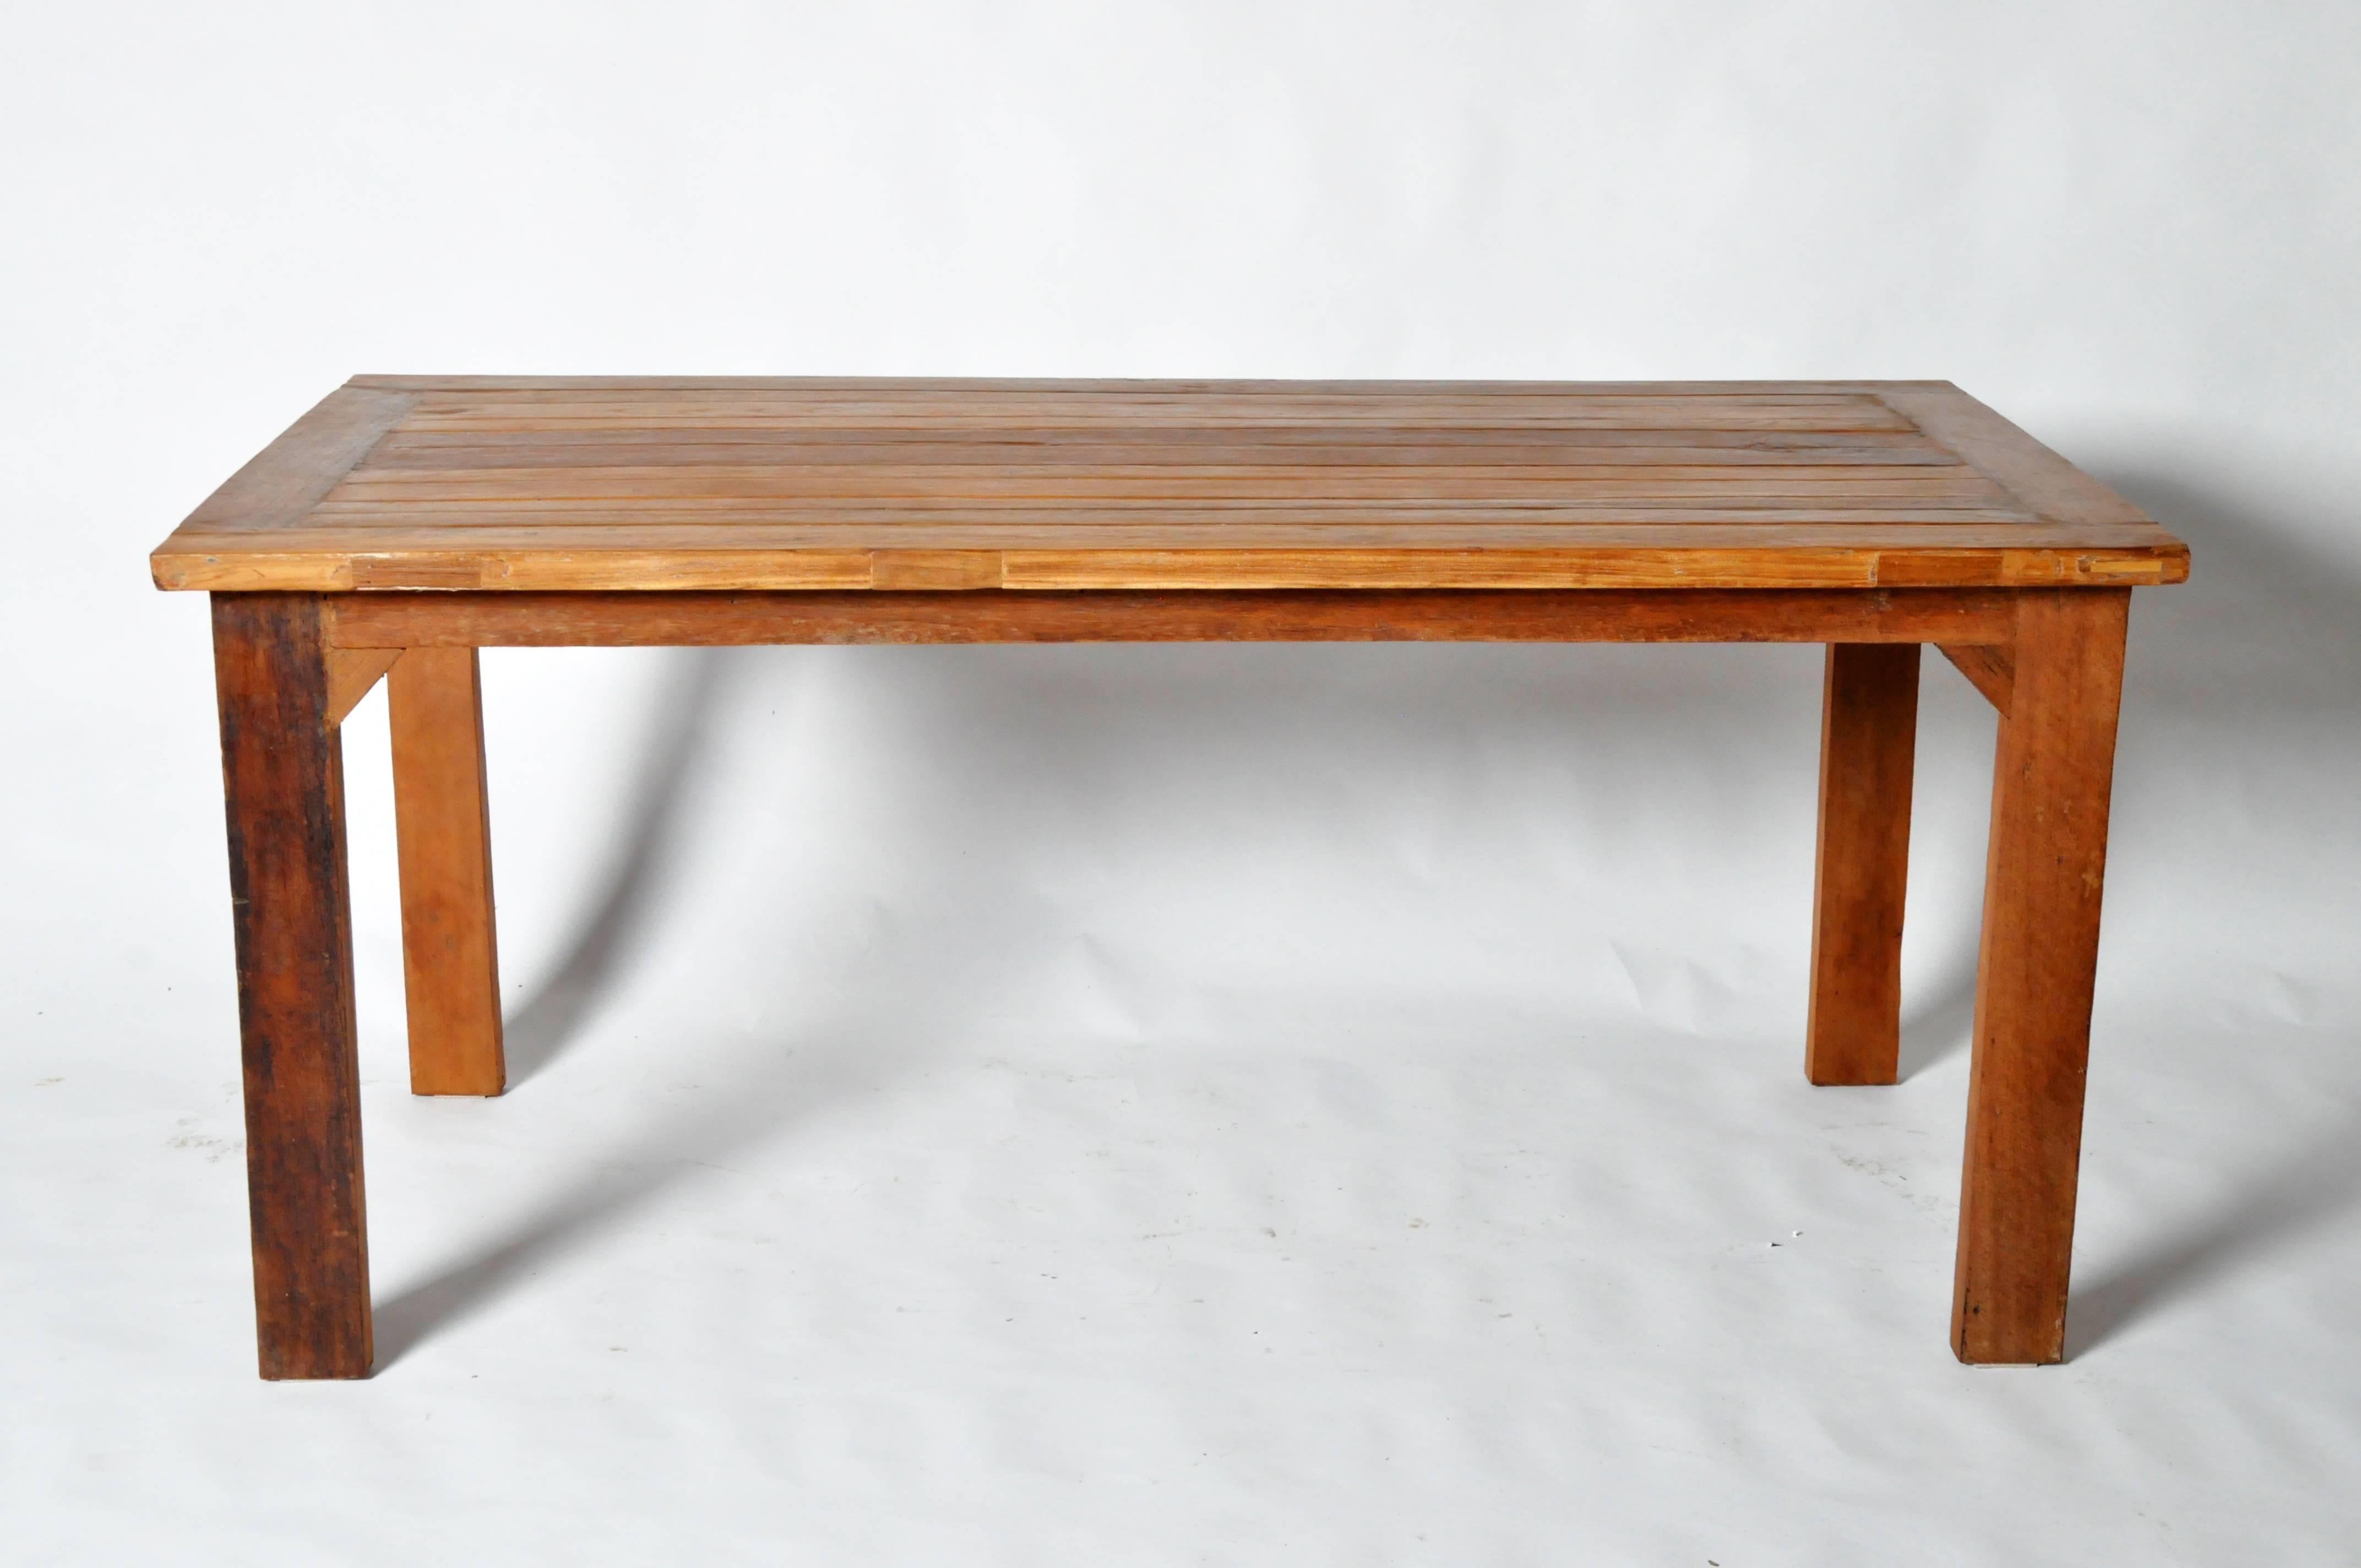 Reclaimed teak wood table for sale at 1stdibs